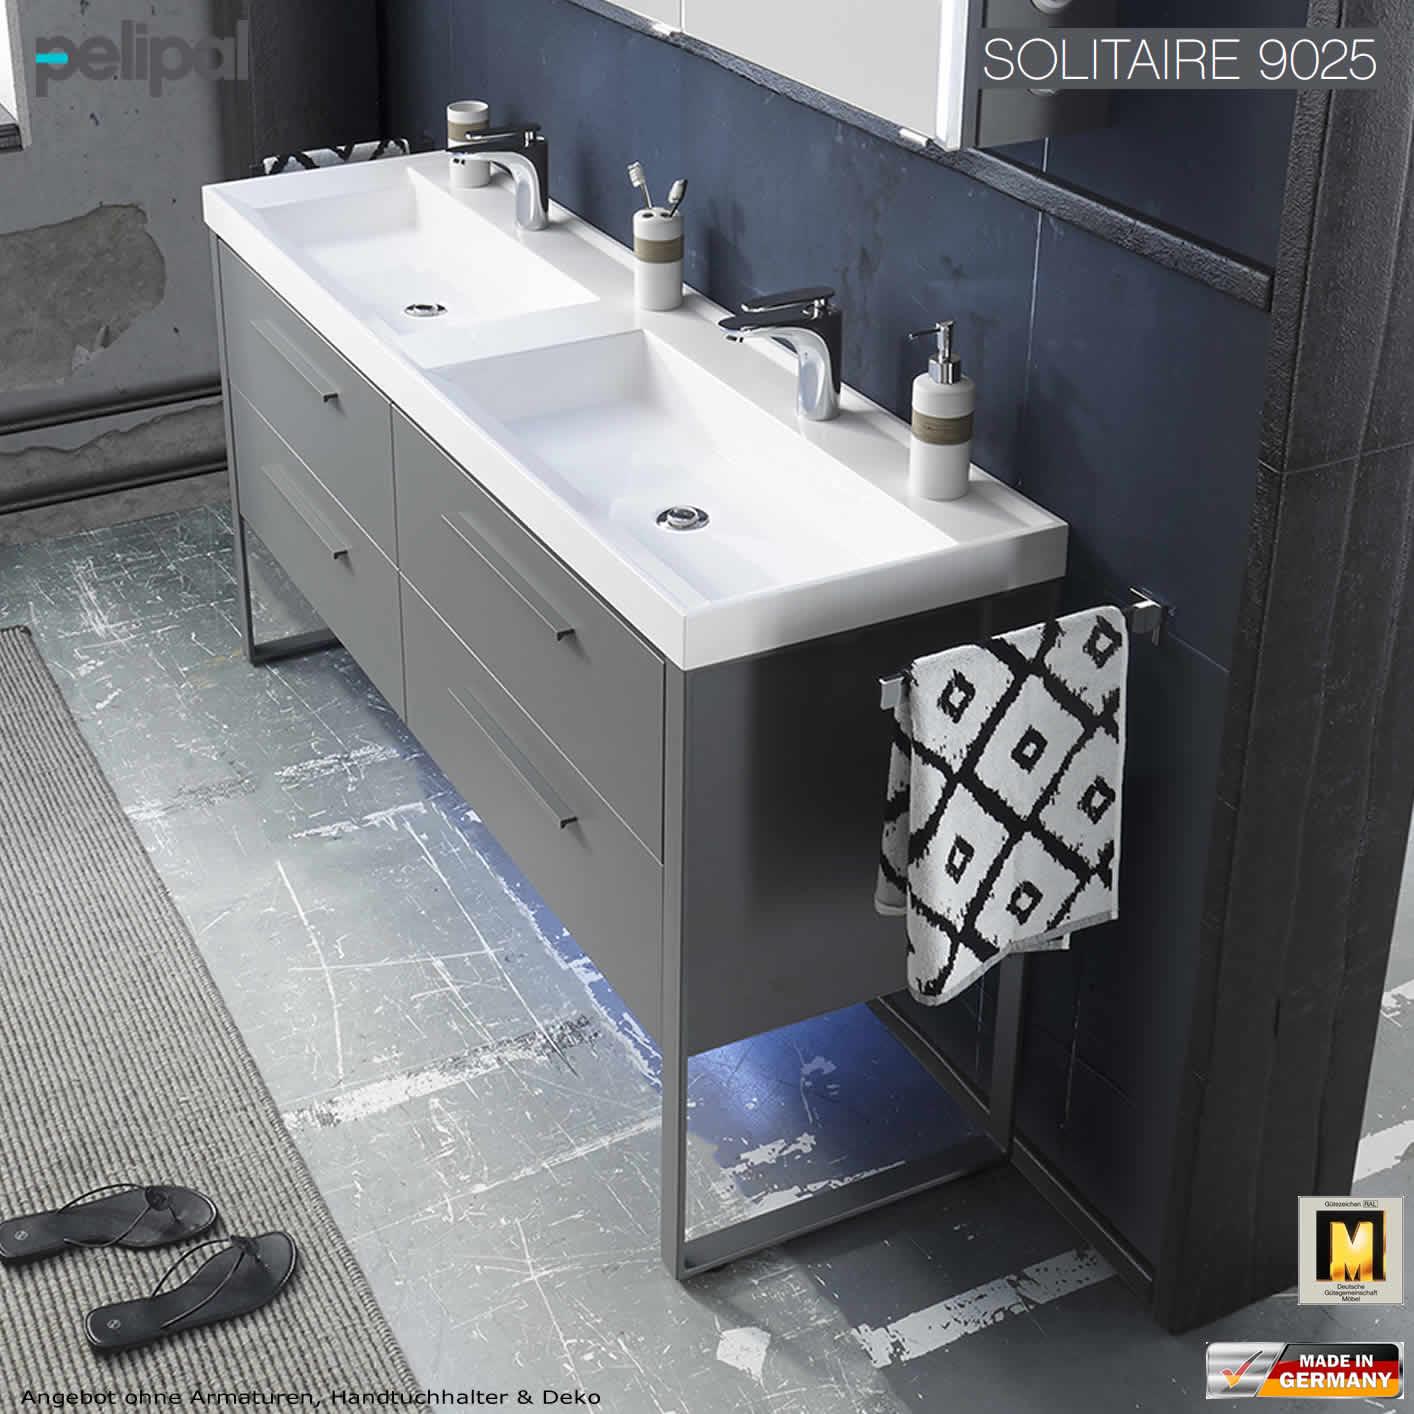 pelipal solitaire 9025 waschtisch set 160 cm breite mineralmarmor impulsbad. Black Bedroom Furniture Sets. Home Design Ideas